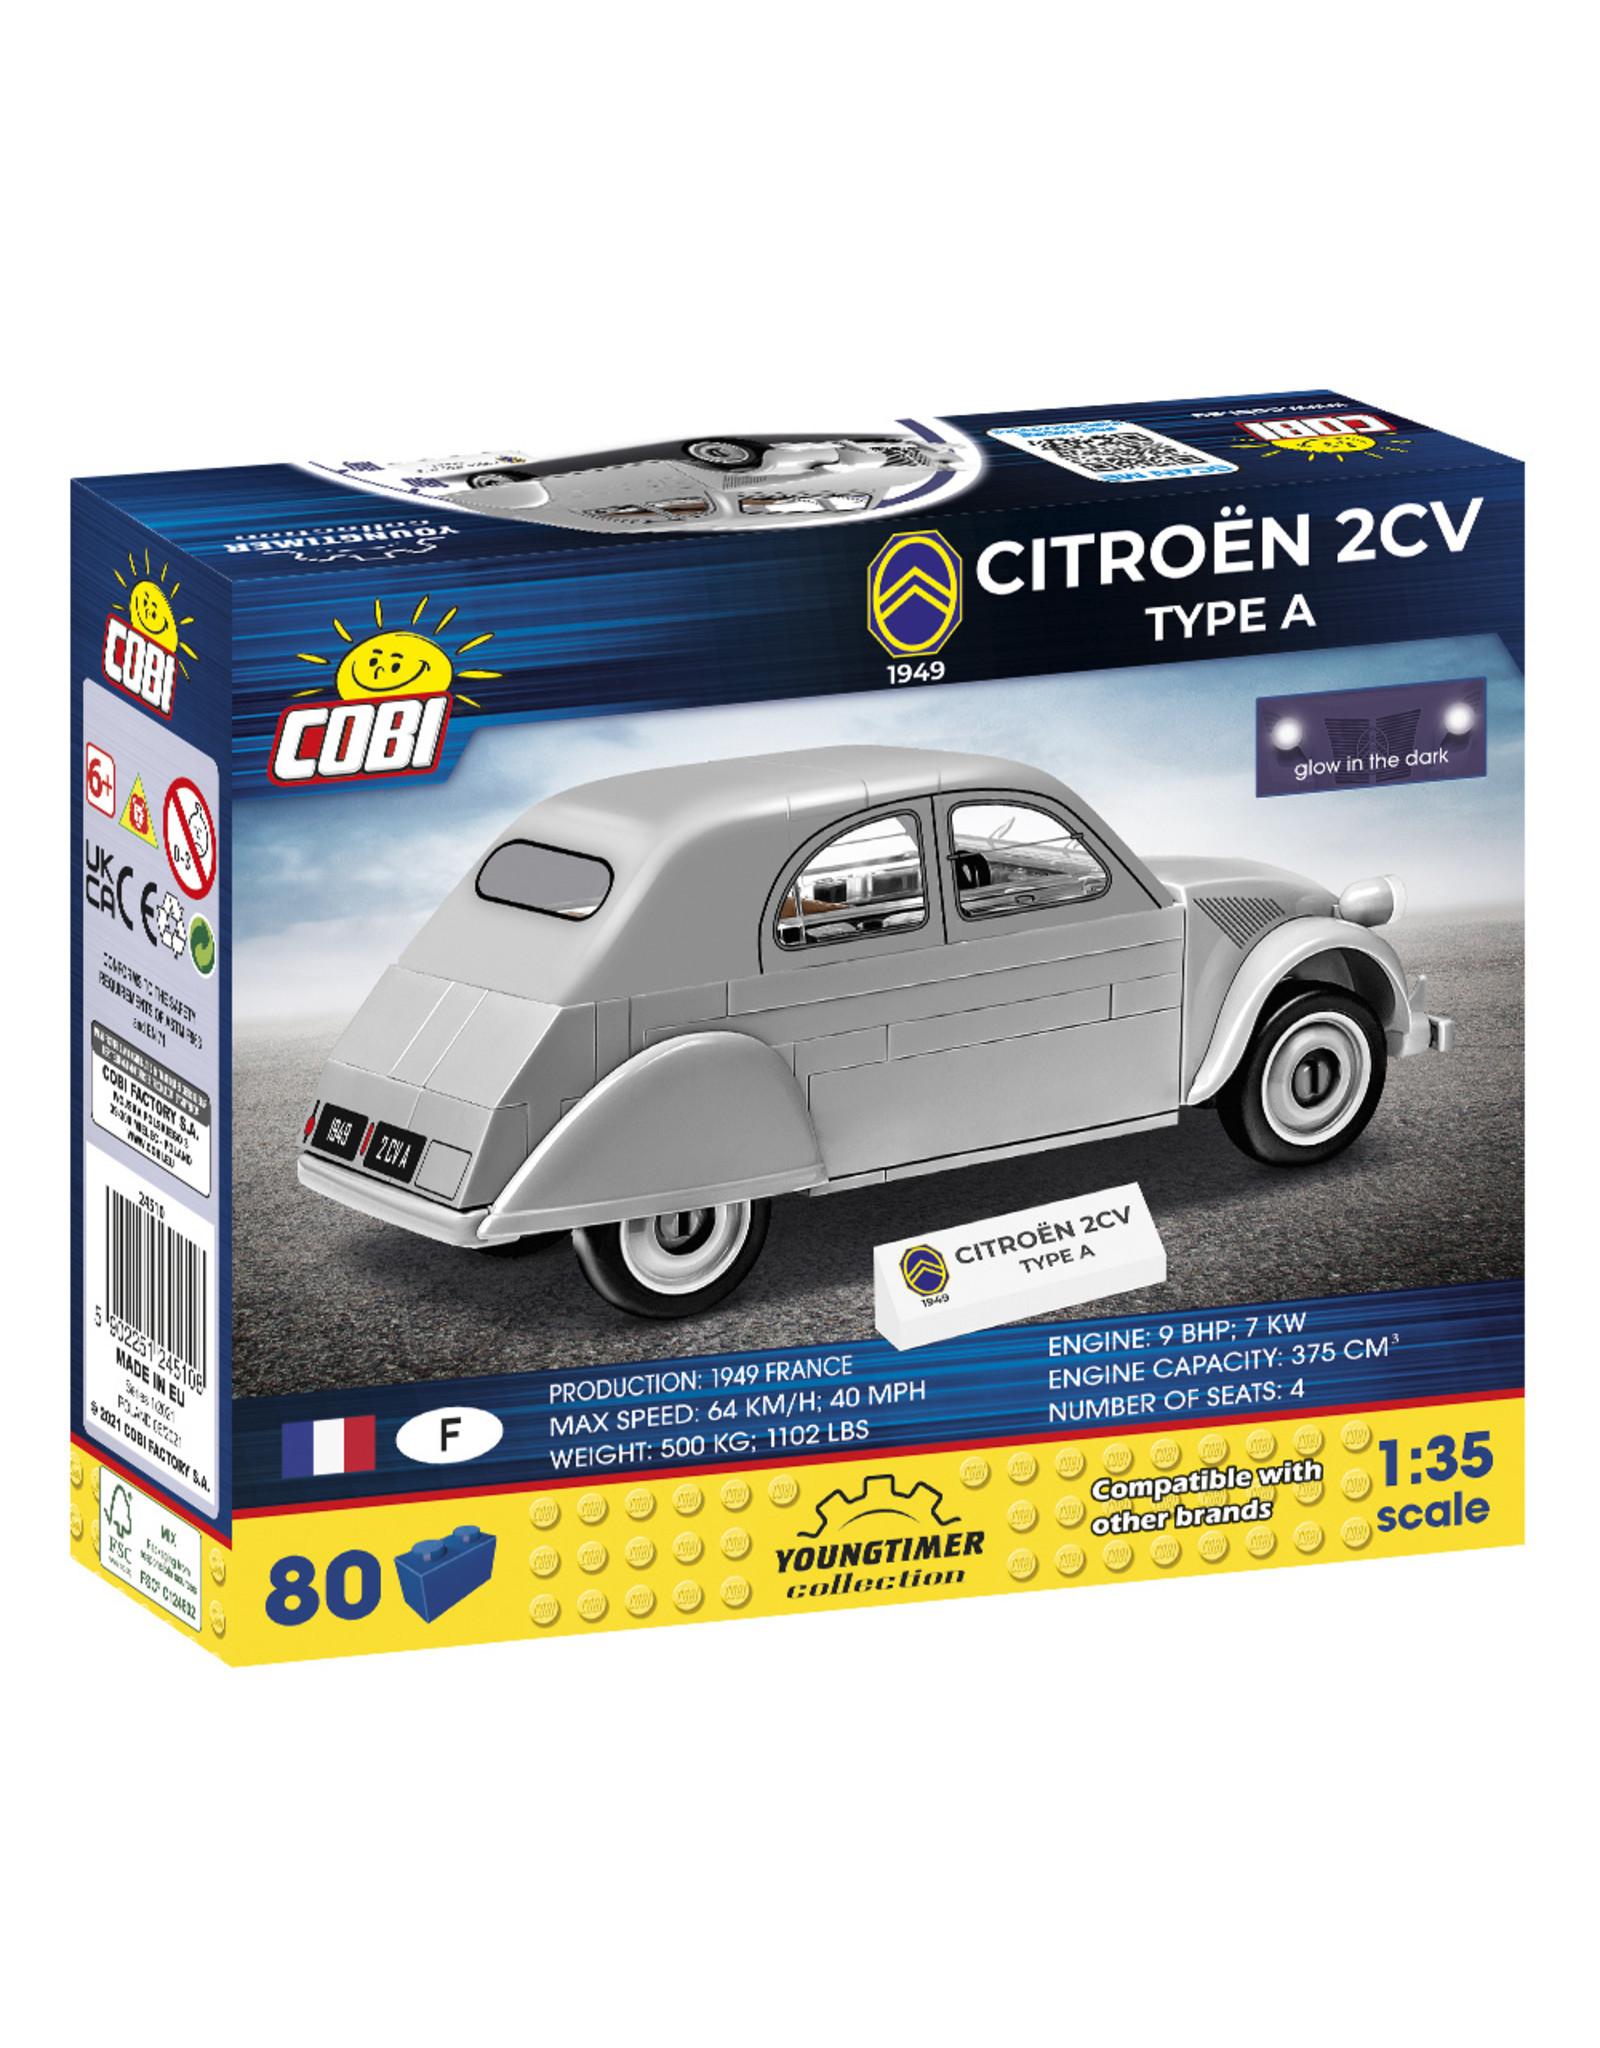 COBI COBI 24510 - Citroën 2CV Type A